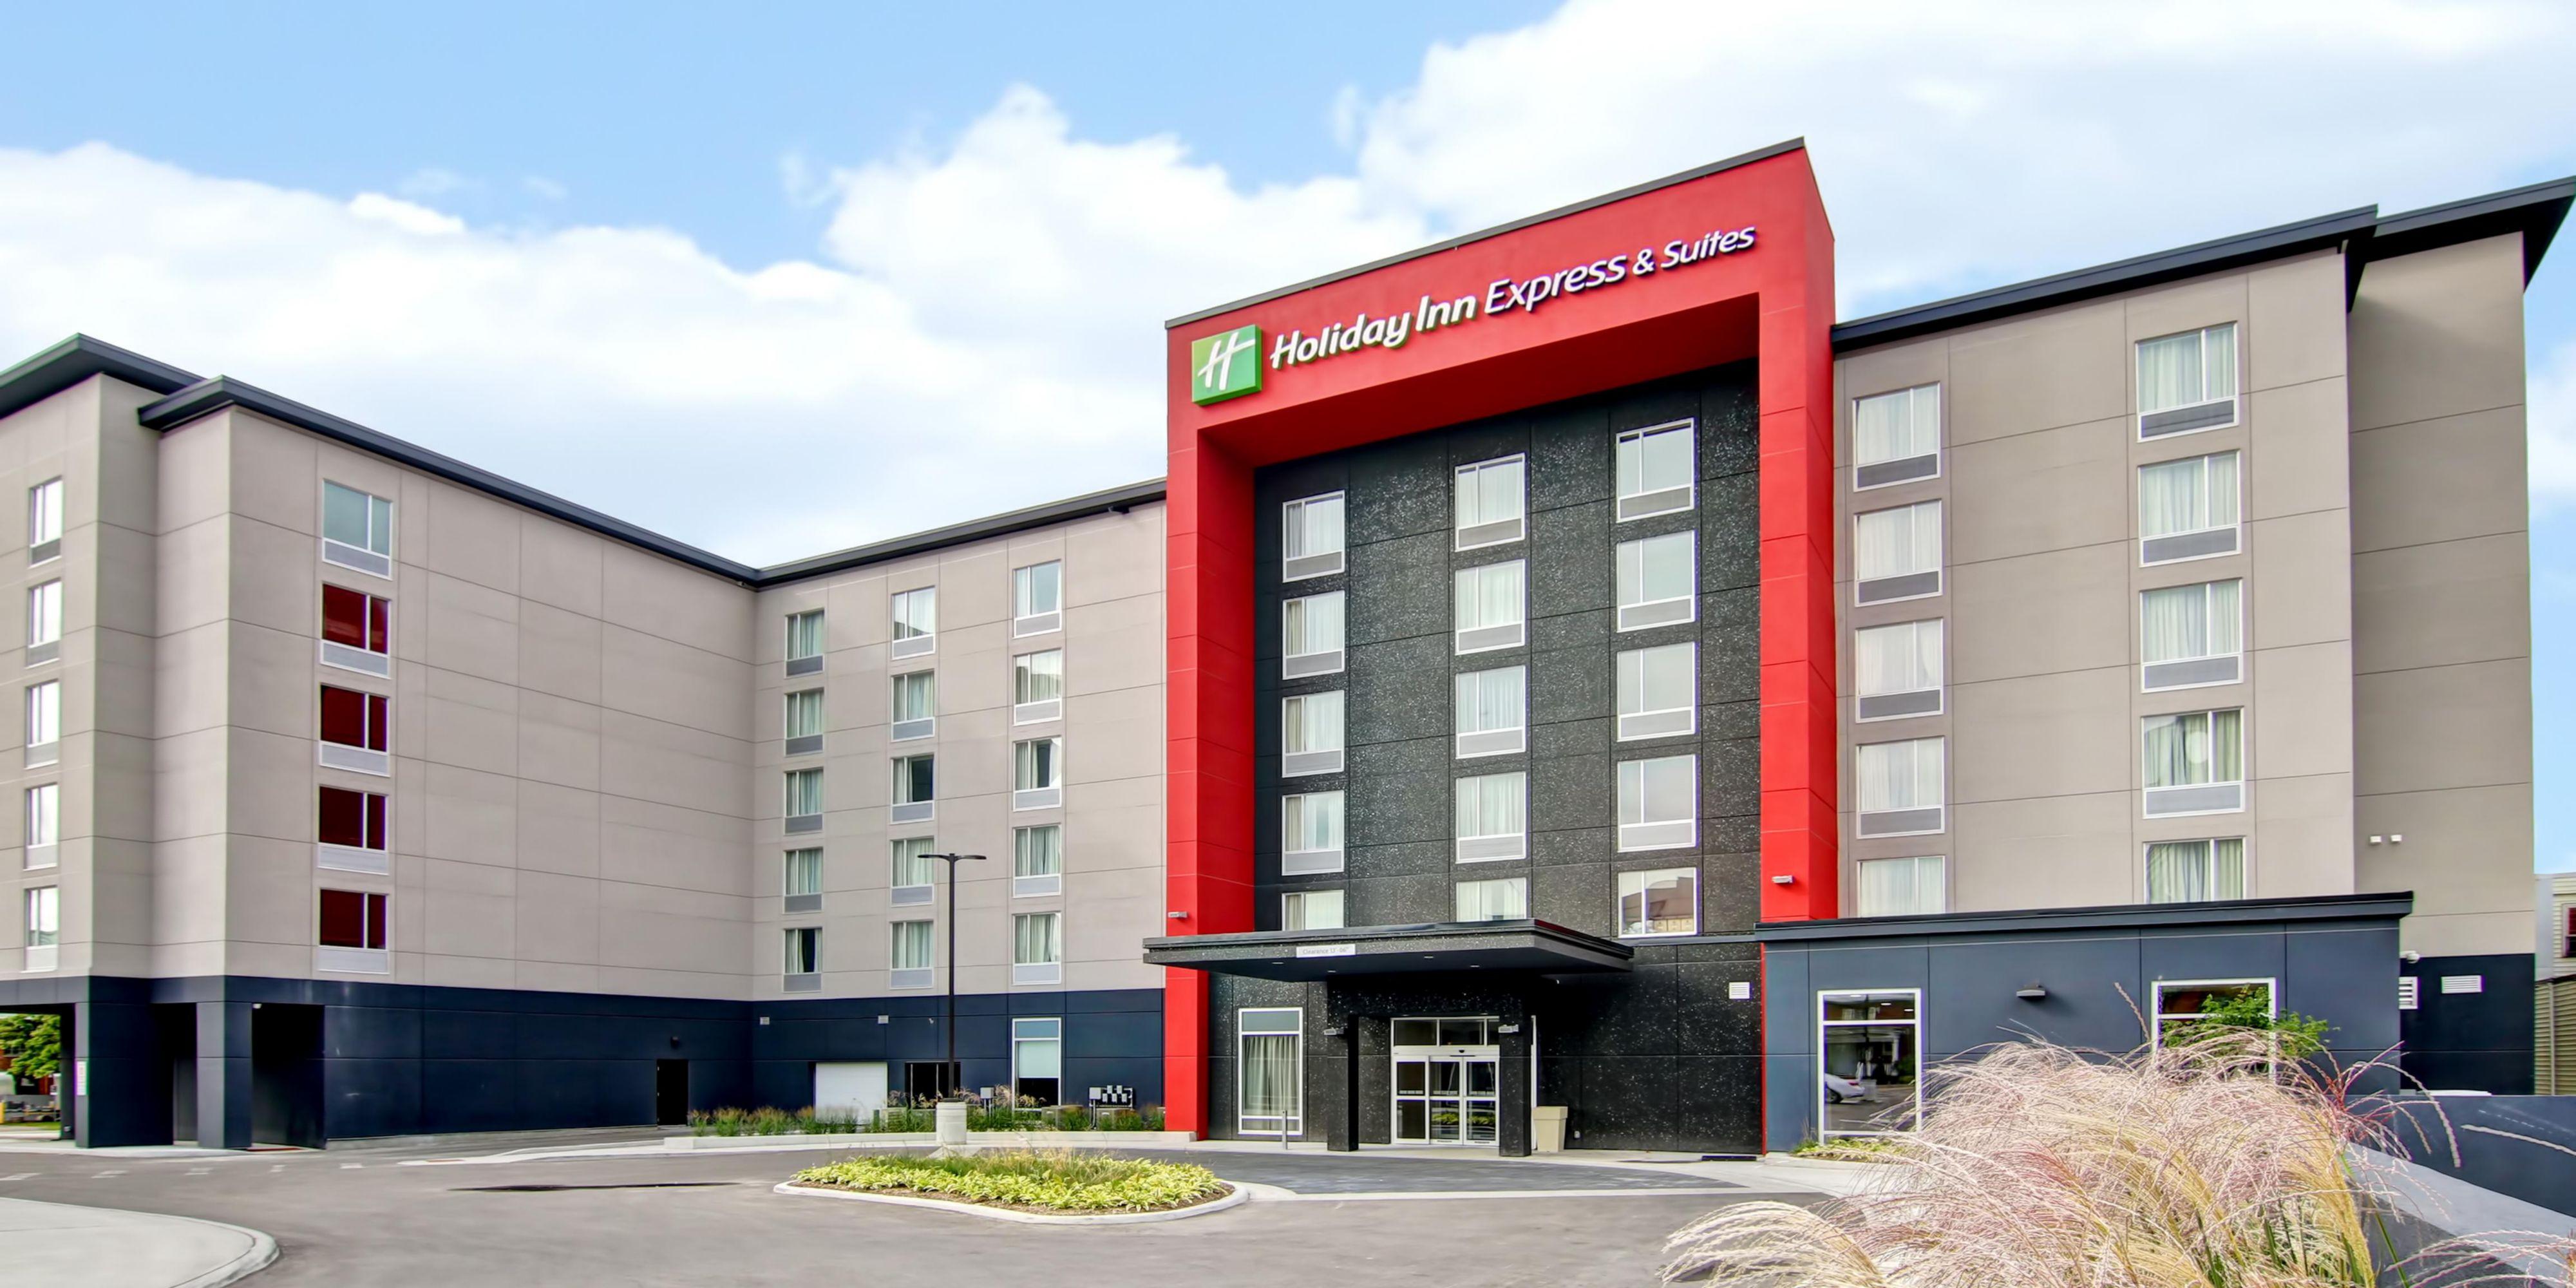 Captivating Holiday Inn Express U0026 Suites Oshawa Downtown   Toronto Area Hotel By IHG